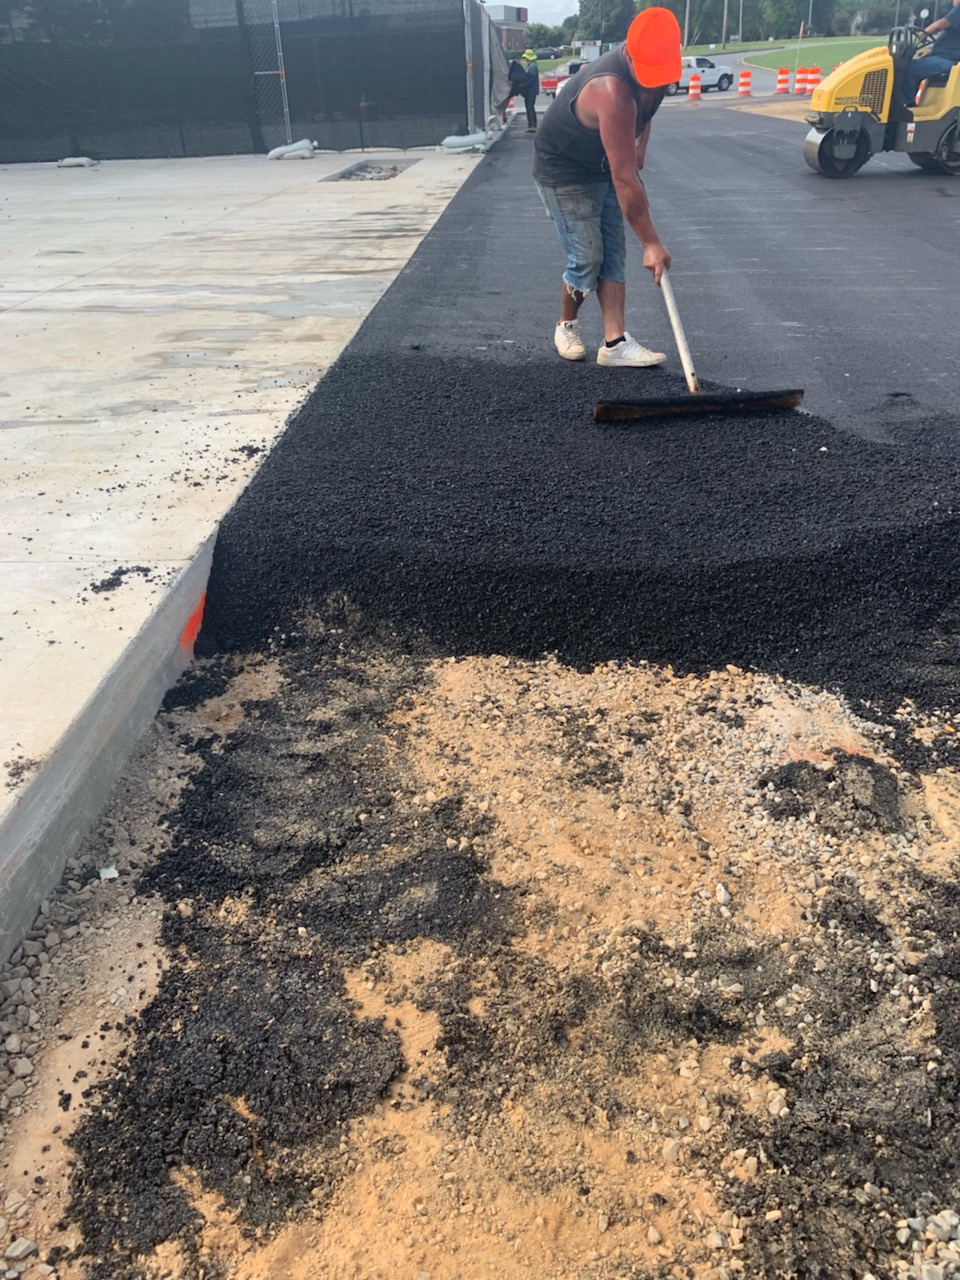 Asphalt Overlay Or Complete Asphalt Replacement Asphalt Paving Contractor Driveway Repair Sealcoating Concrete Pourer